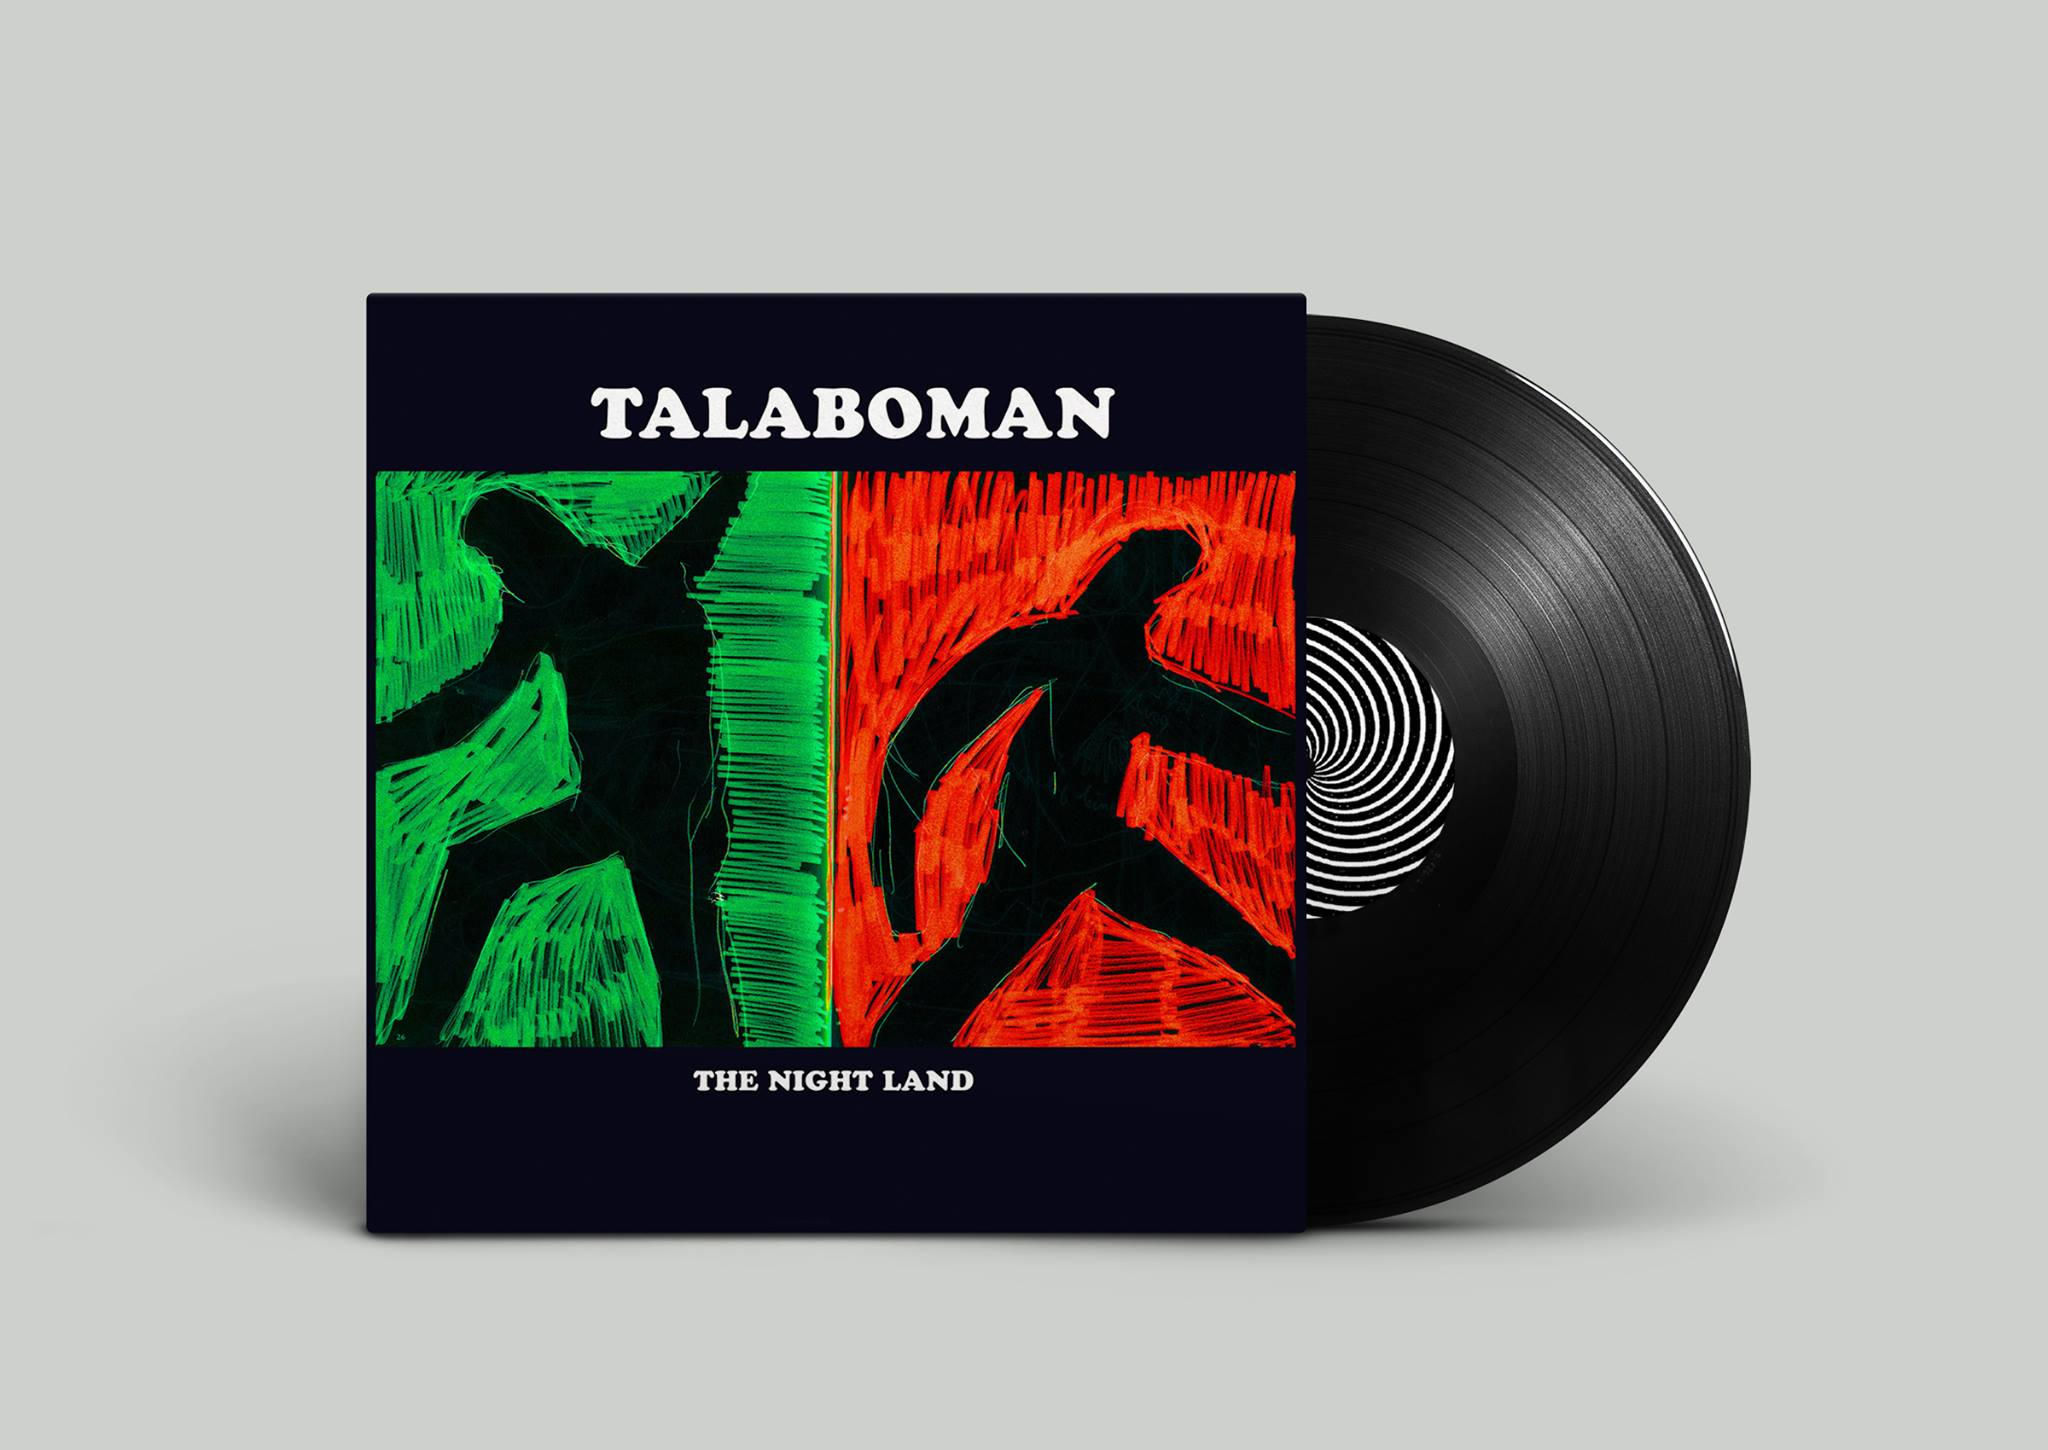 Talaboman | The Night Land vinyl